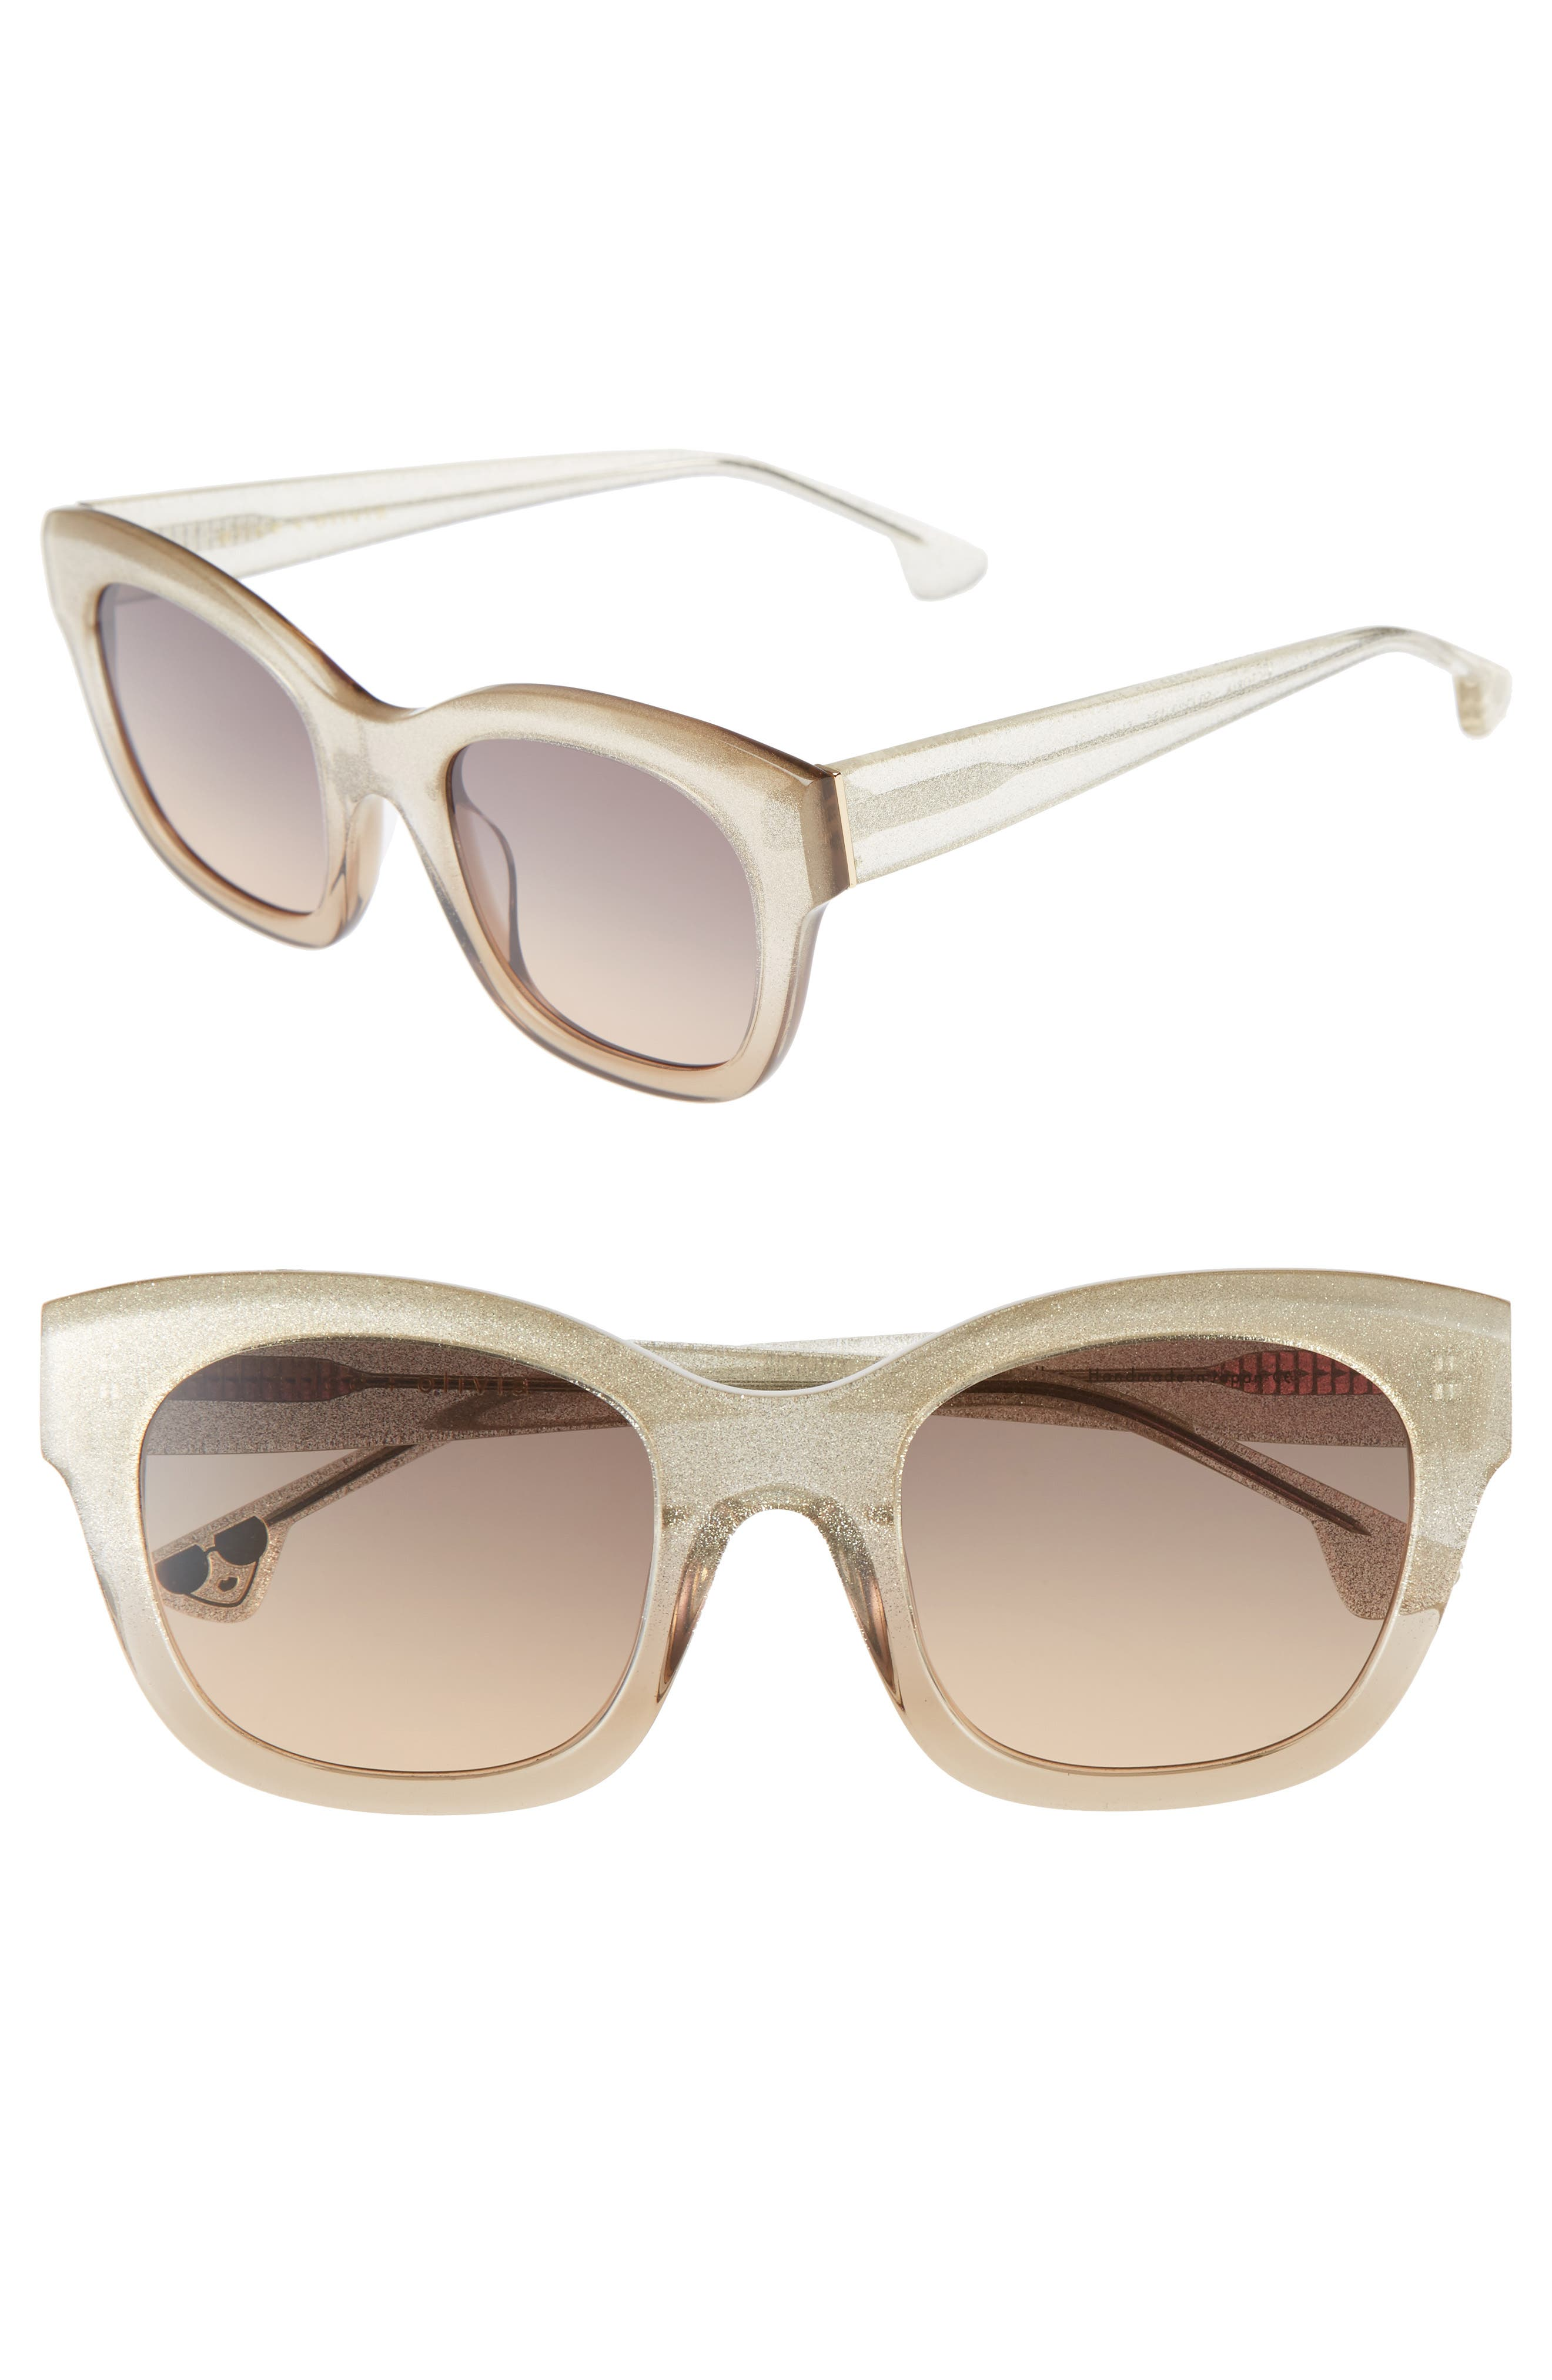 Main Image - Alice + Olivia Victoria 50mm Cat Eye Sunglasses